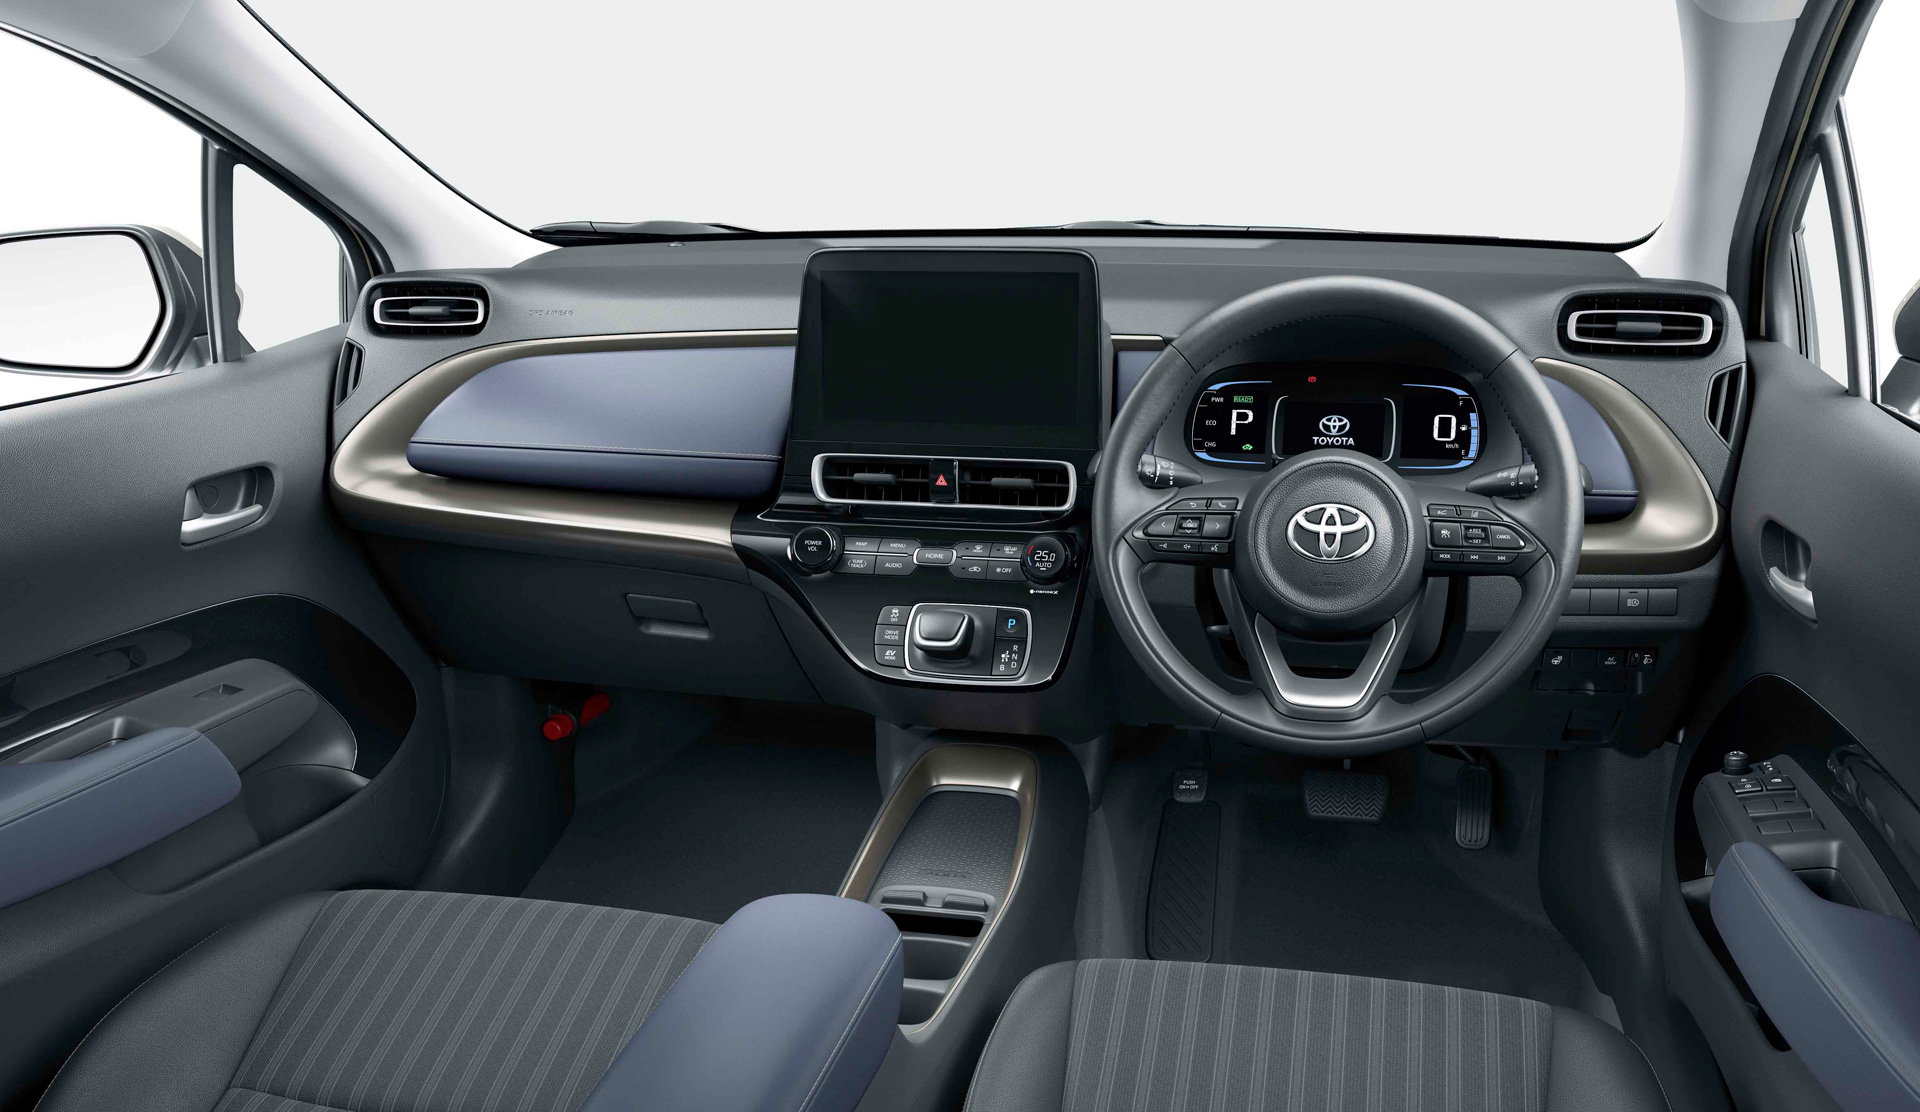 Toyota to Launch All-New Aqua - Image 3